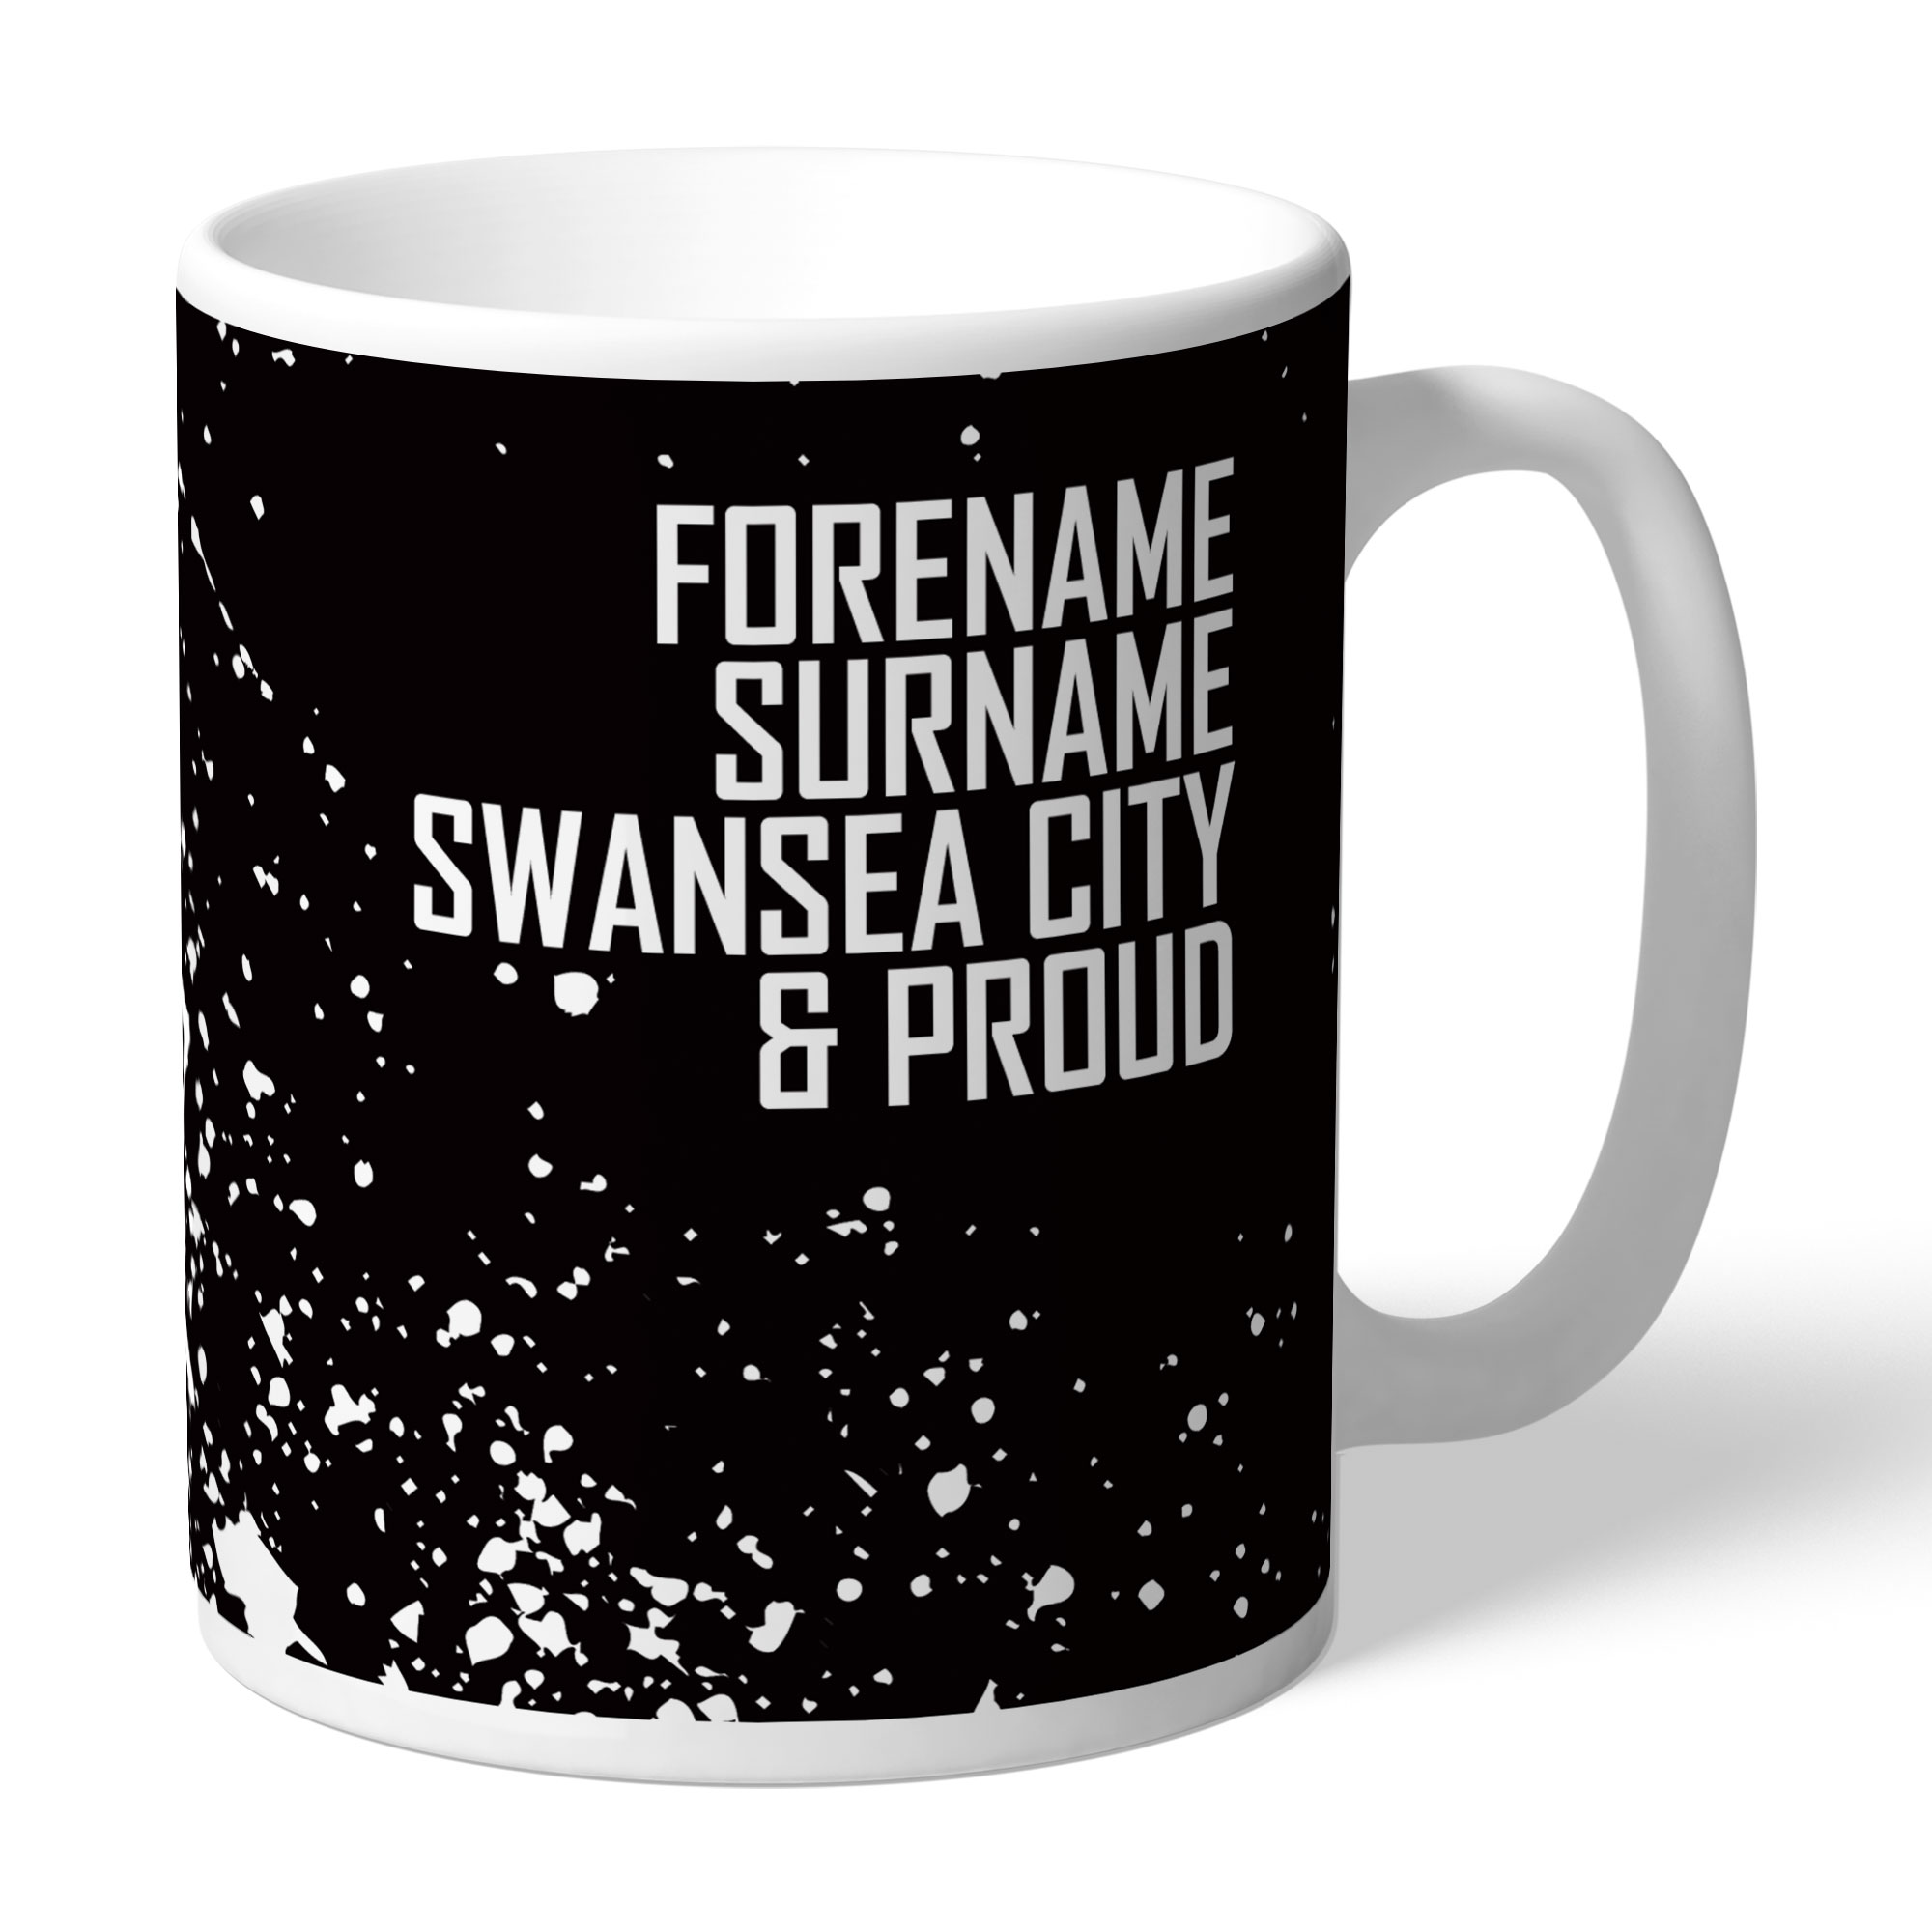 Personalised Swansea City FC Proud Mug